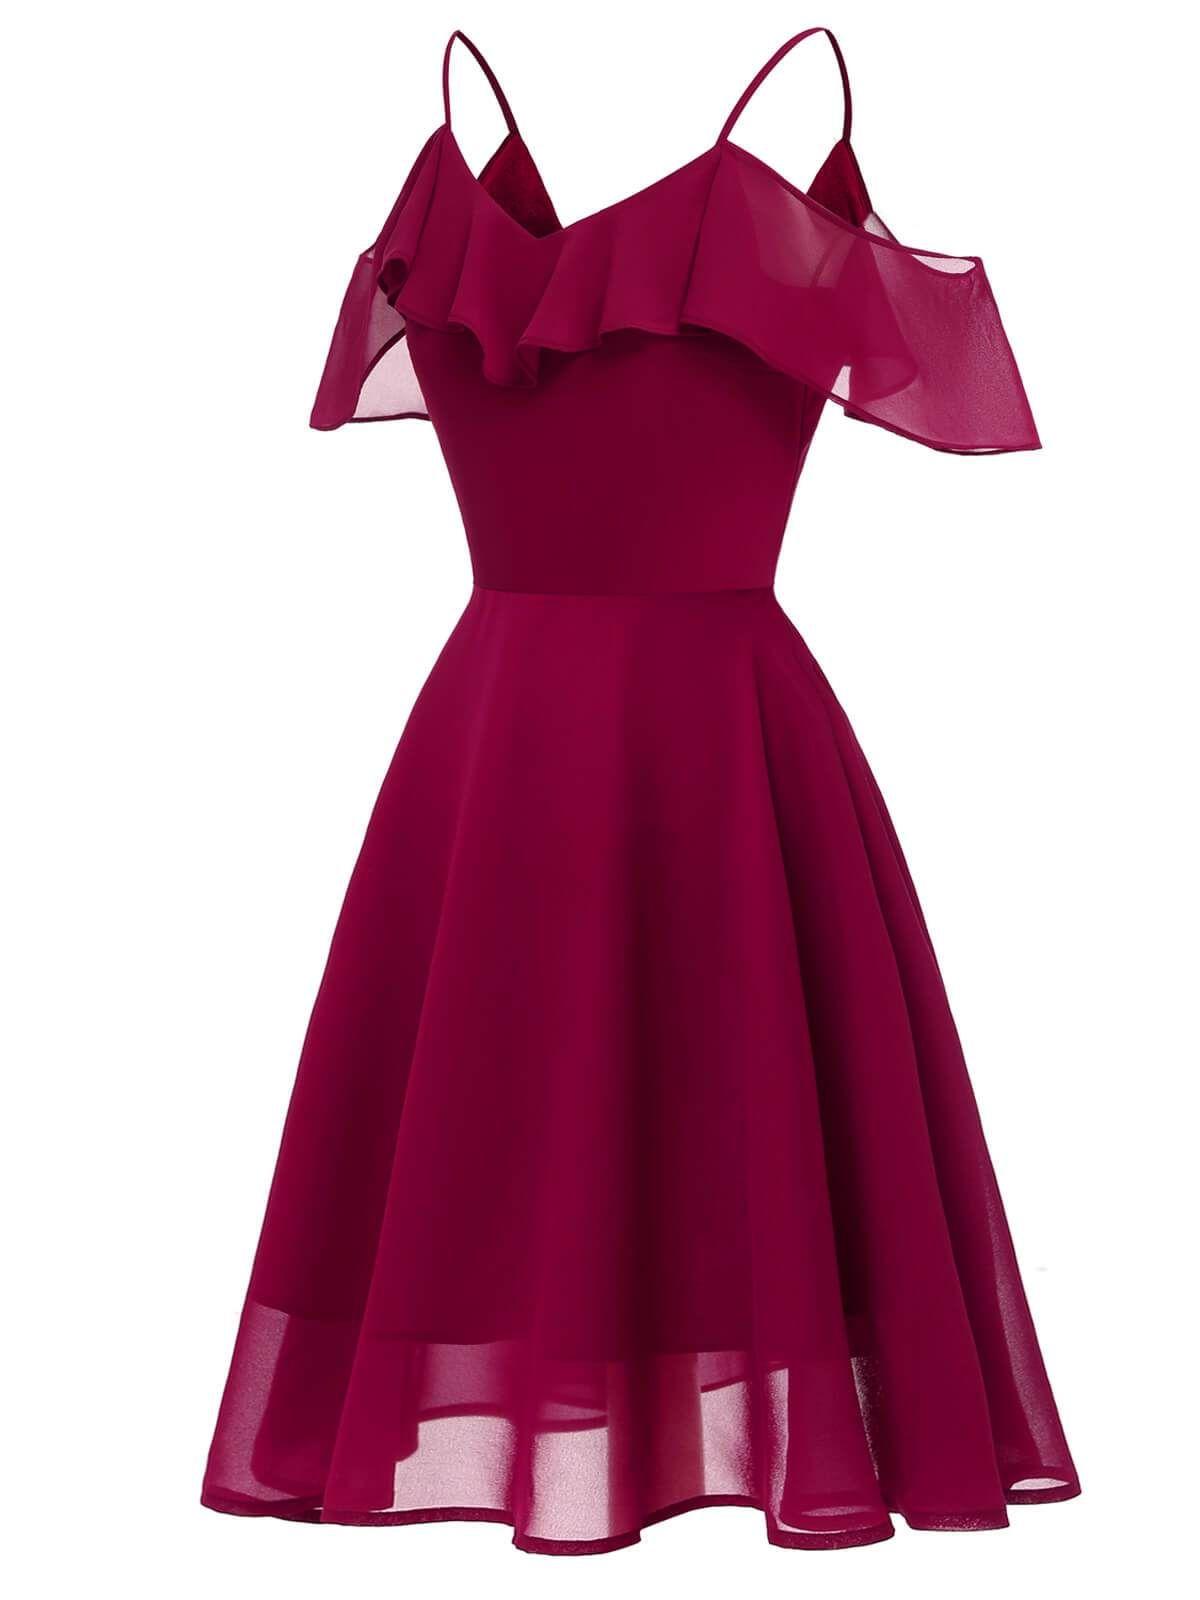 1950s Lace Cold Shoulder Ruffle Dress Spaghetti Strap Prom Dress Cute Prom Dresses Womens Dresses [ 1600 x 1200 Pixel ]